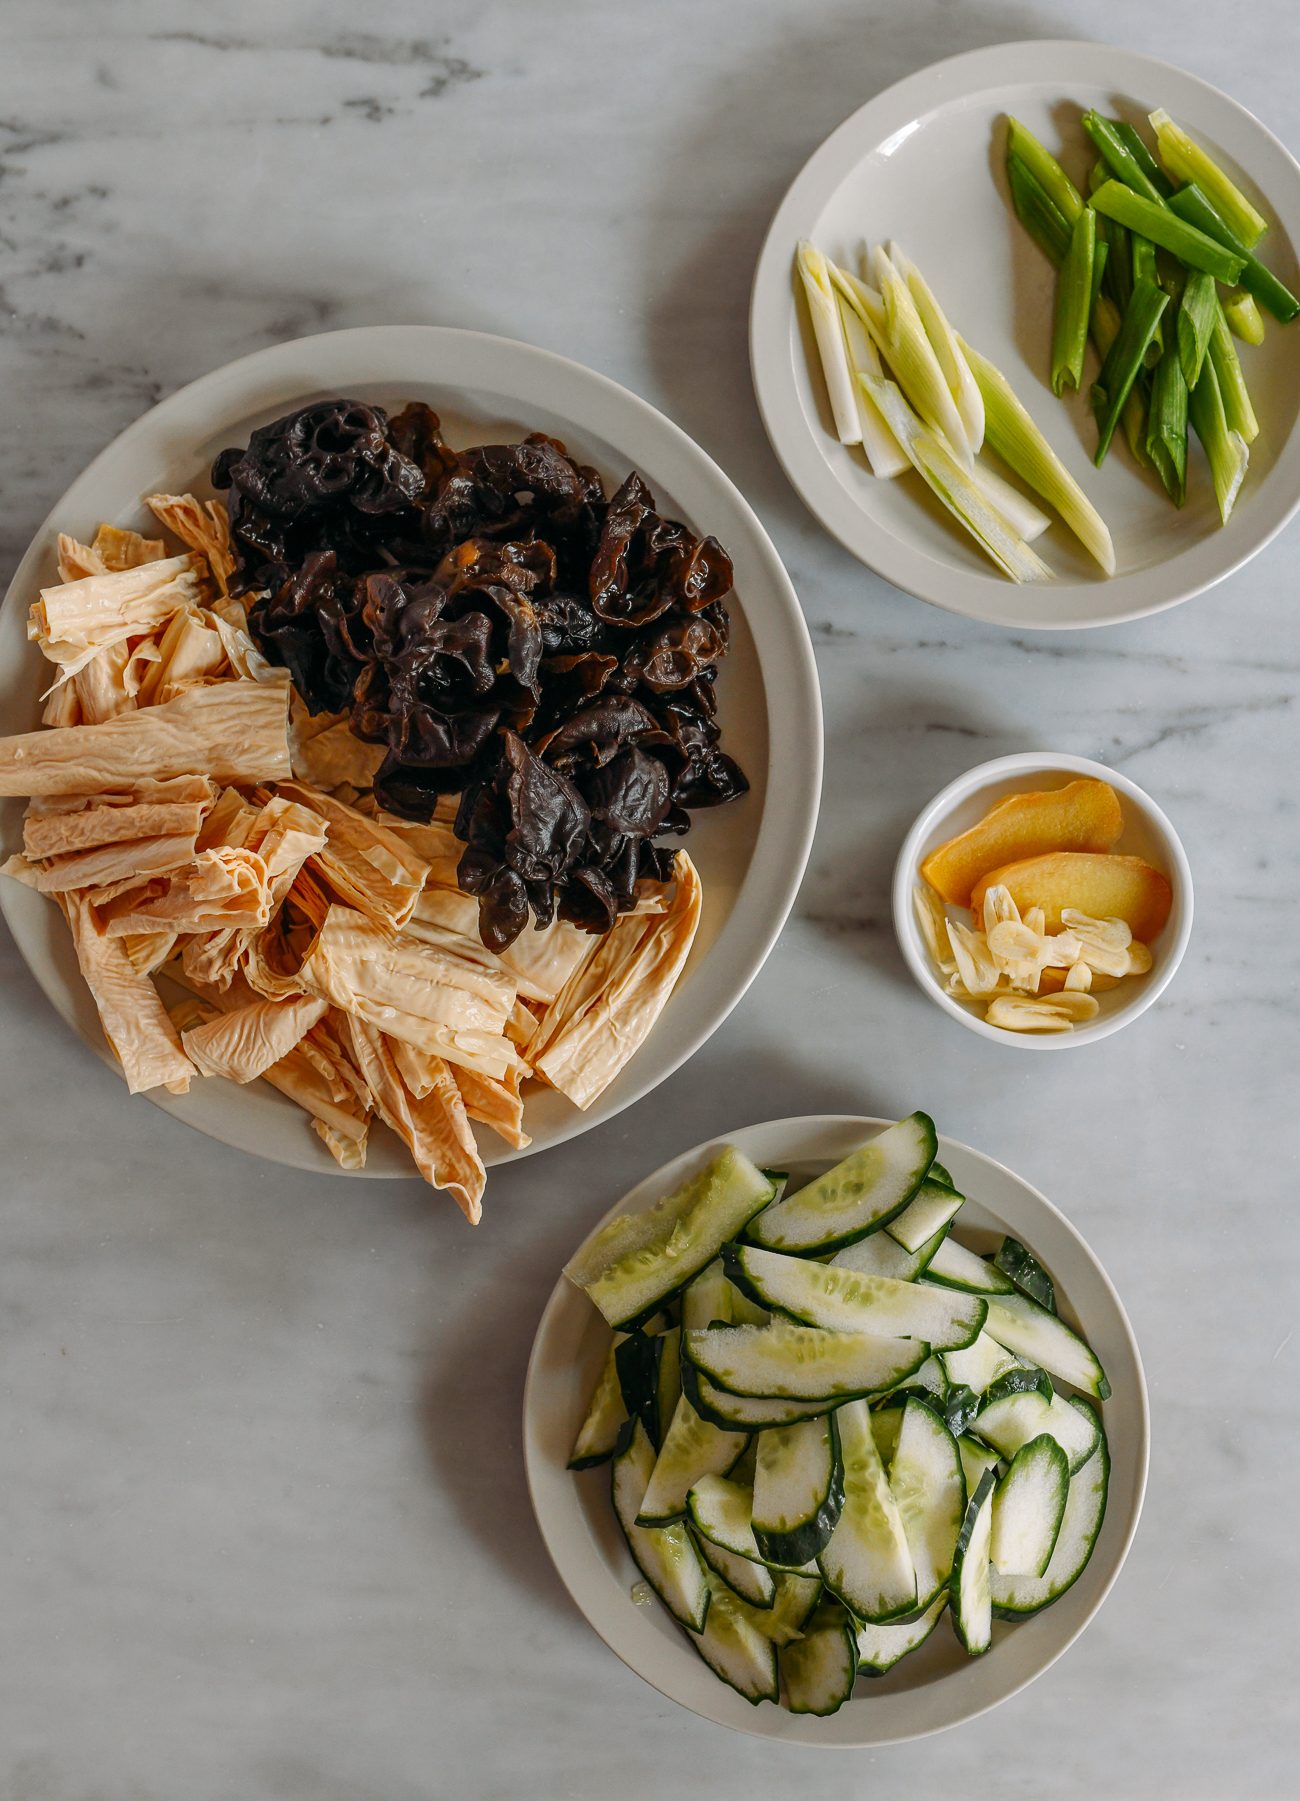 Bean Threads, Wood Ears, Cucumbers for stir-fry